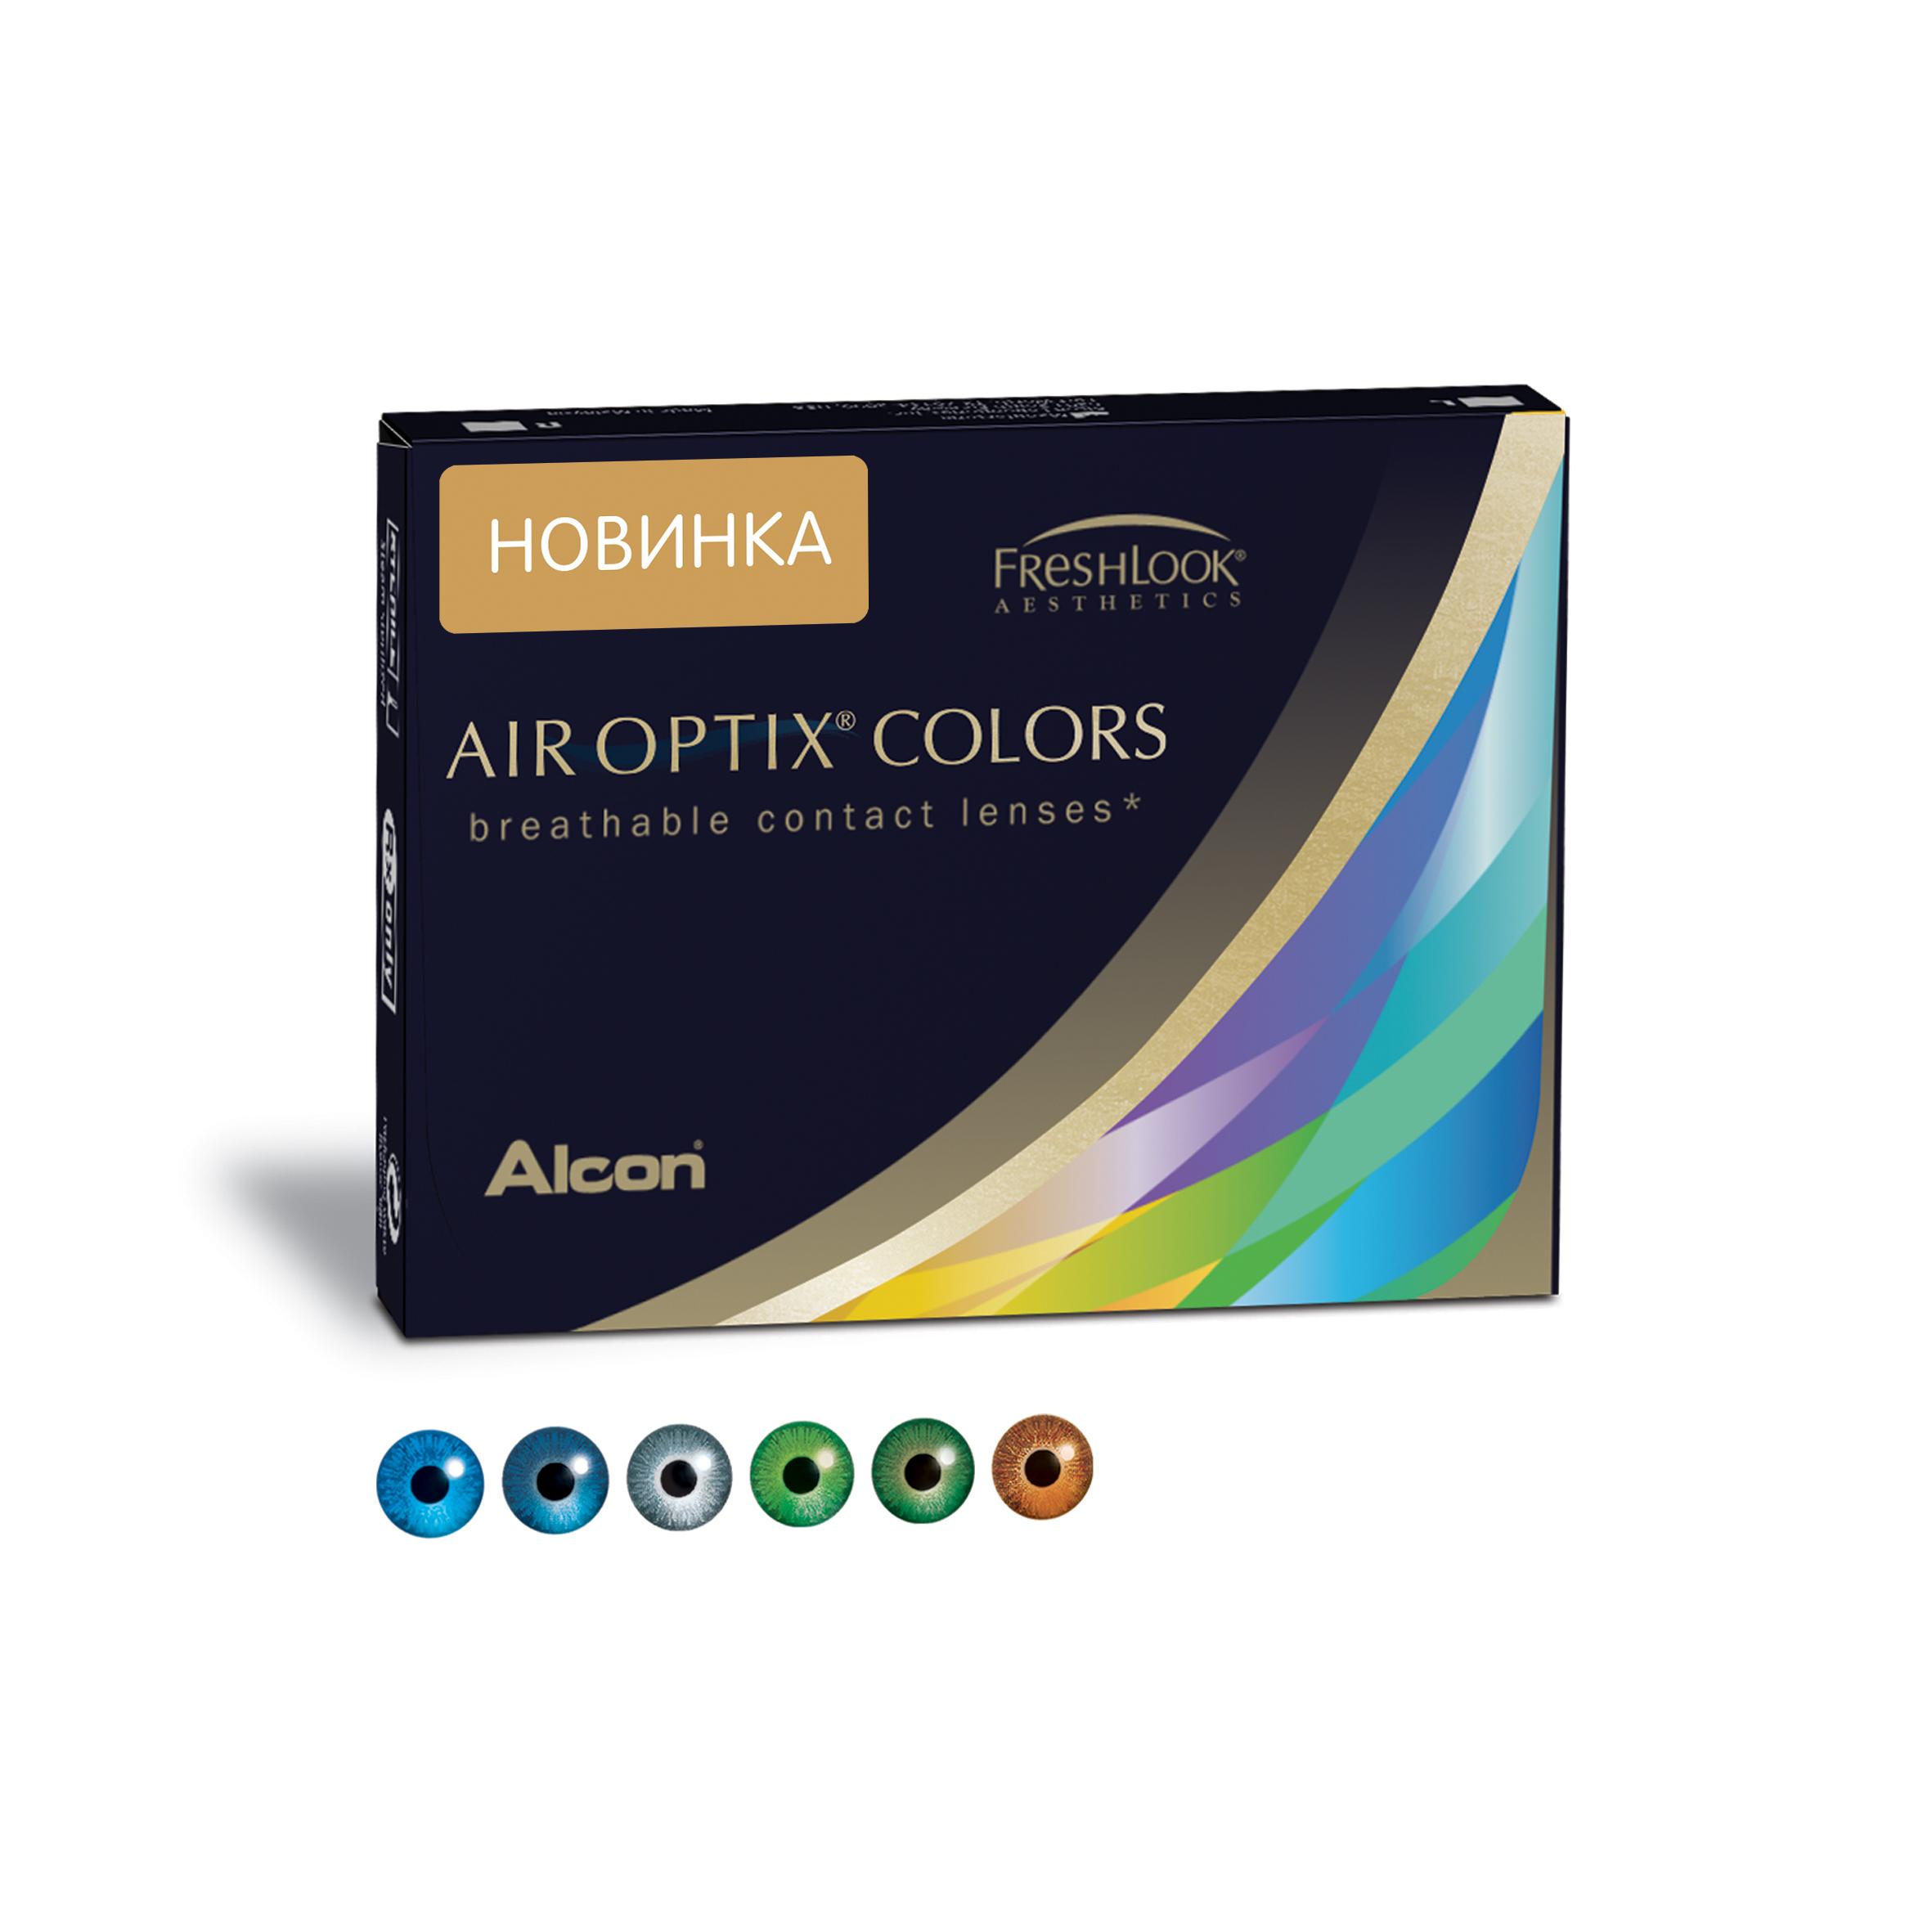 Аlcon контактные линзы Air Optix Colors 2 шт -4.50 Gemstone Green31746250Мягкие контактные линзы